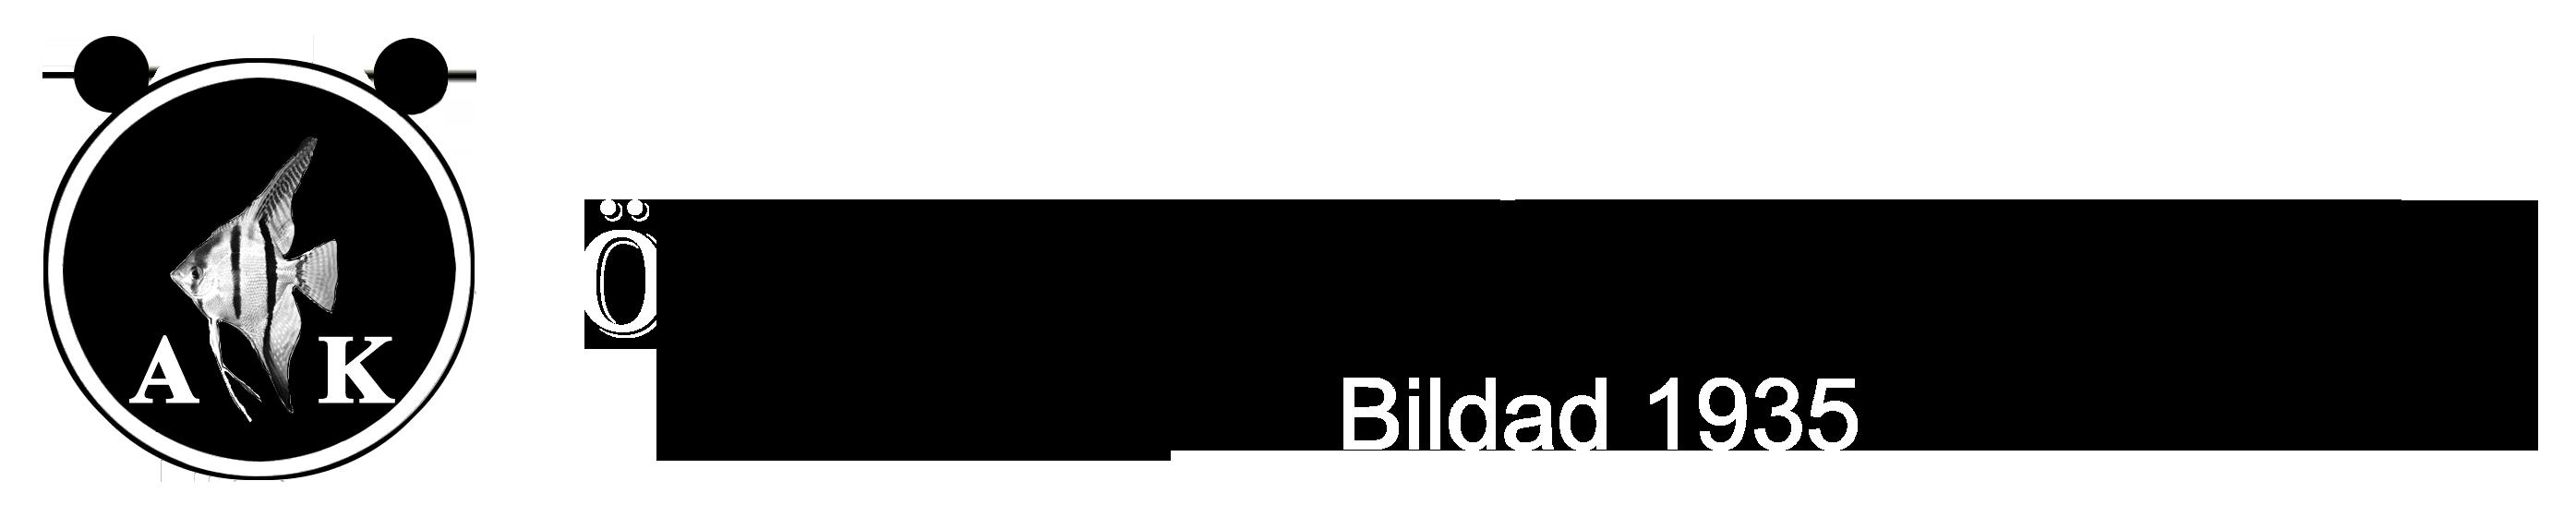 Örebro Akvarieklubb